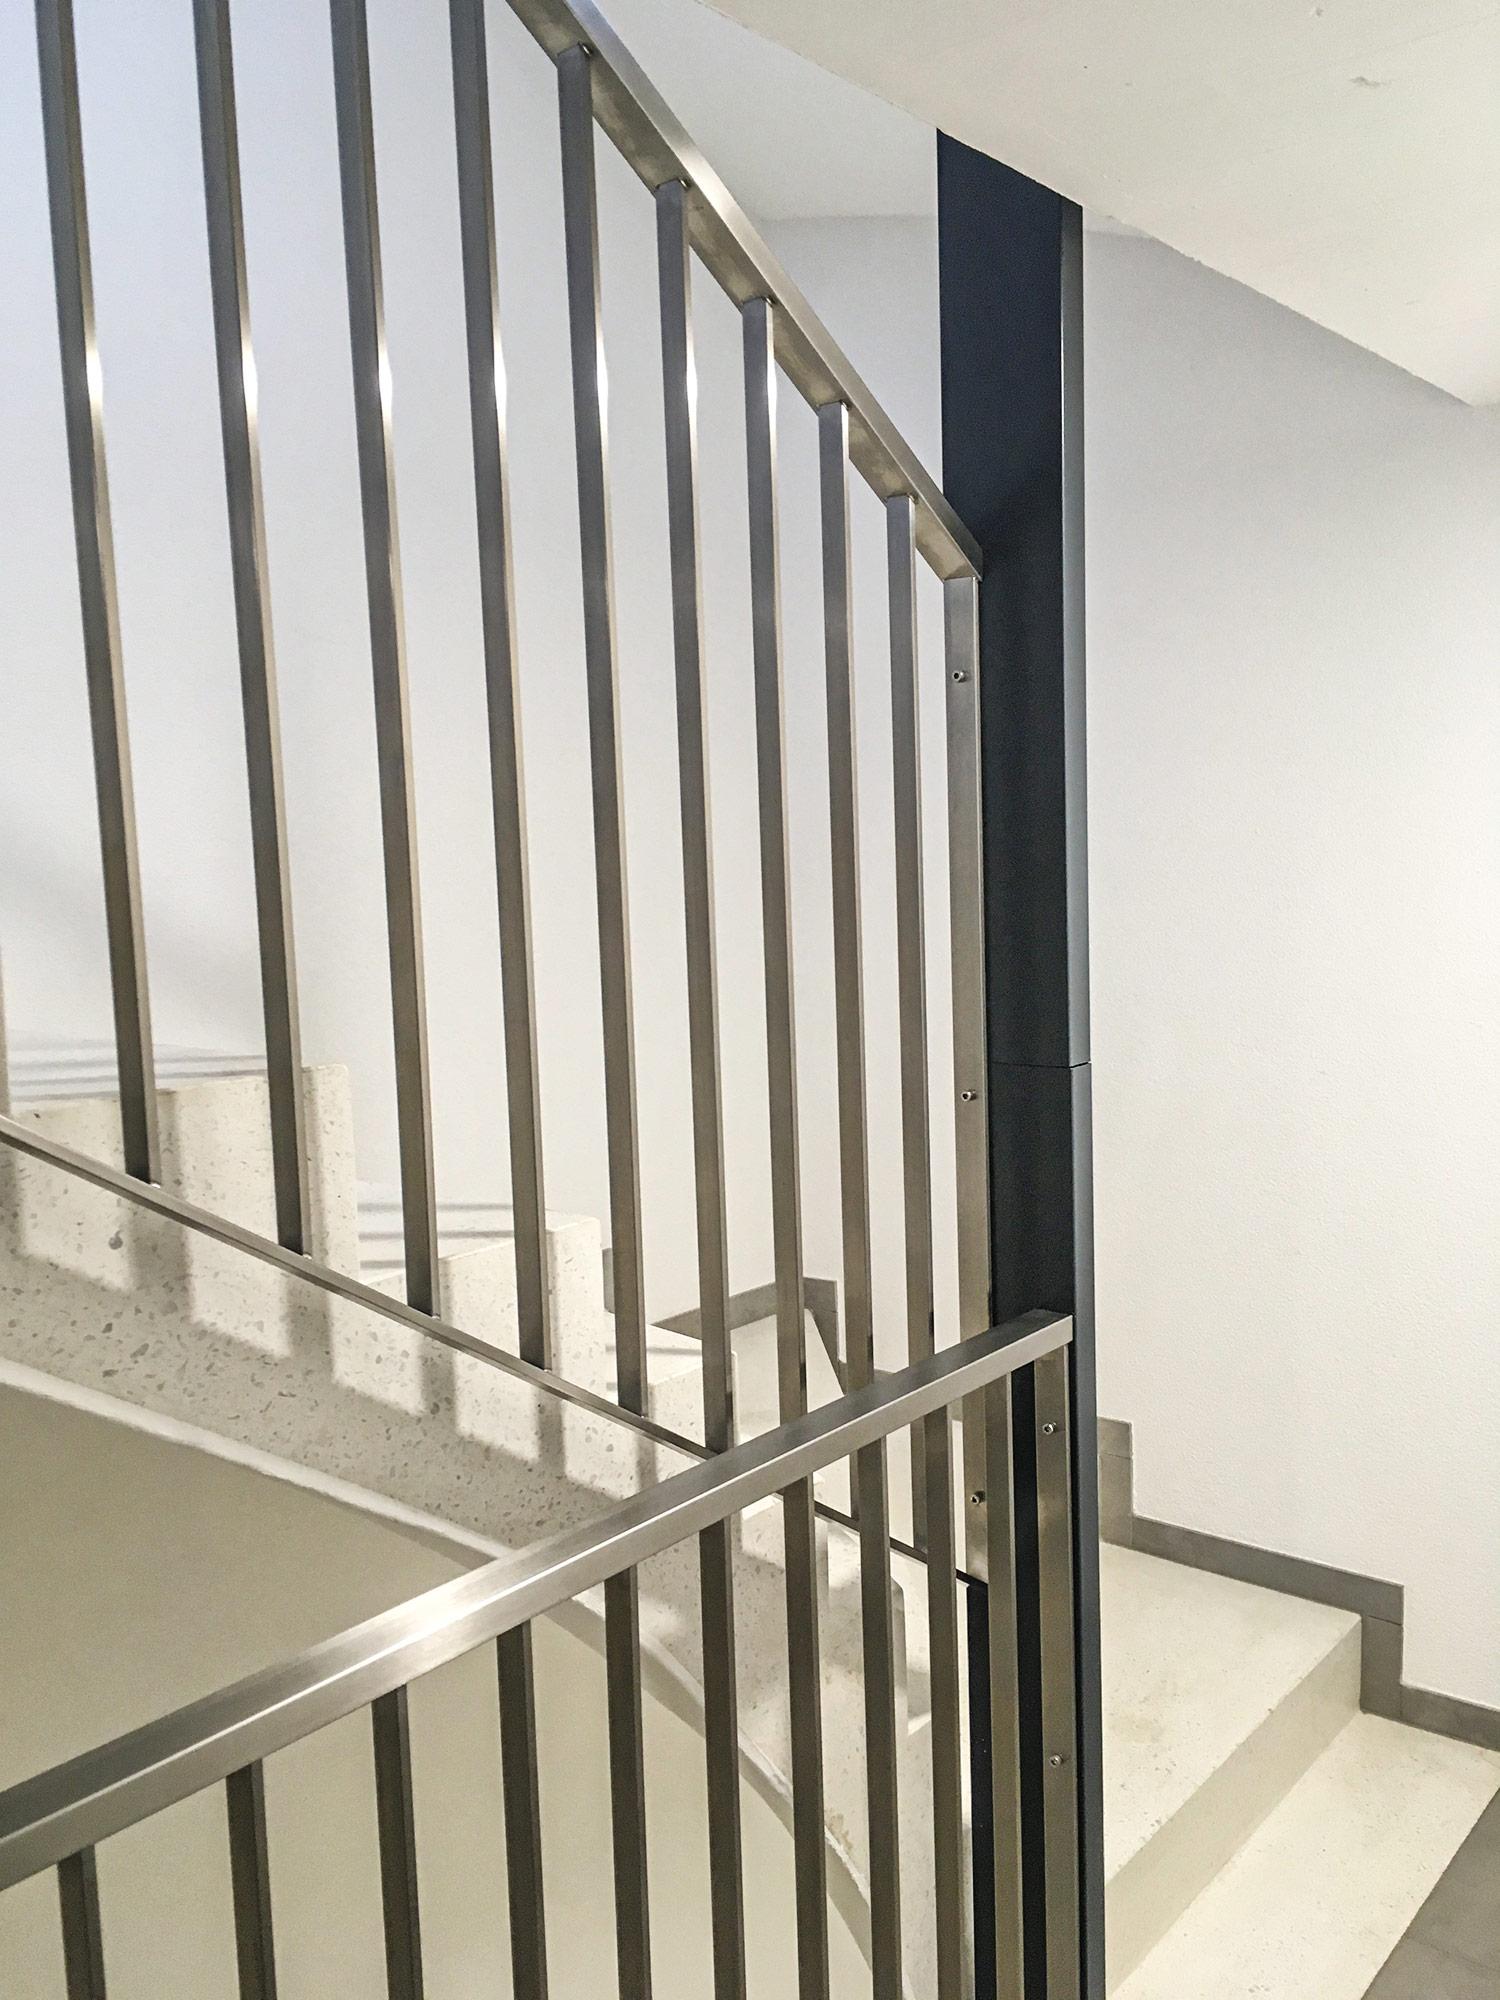 Barrière en acier-inox cage d'escalier